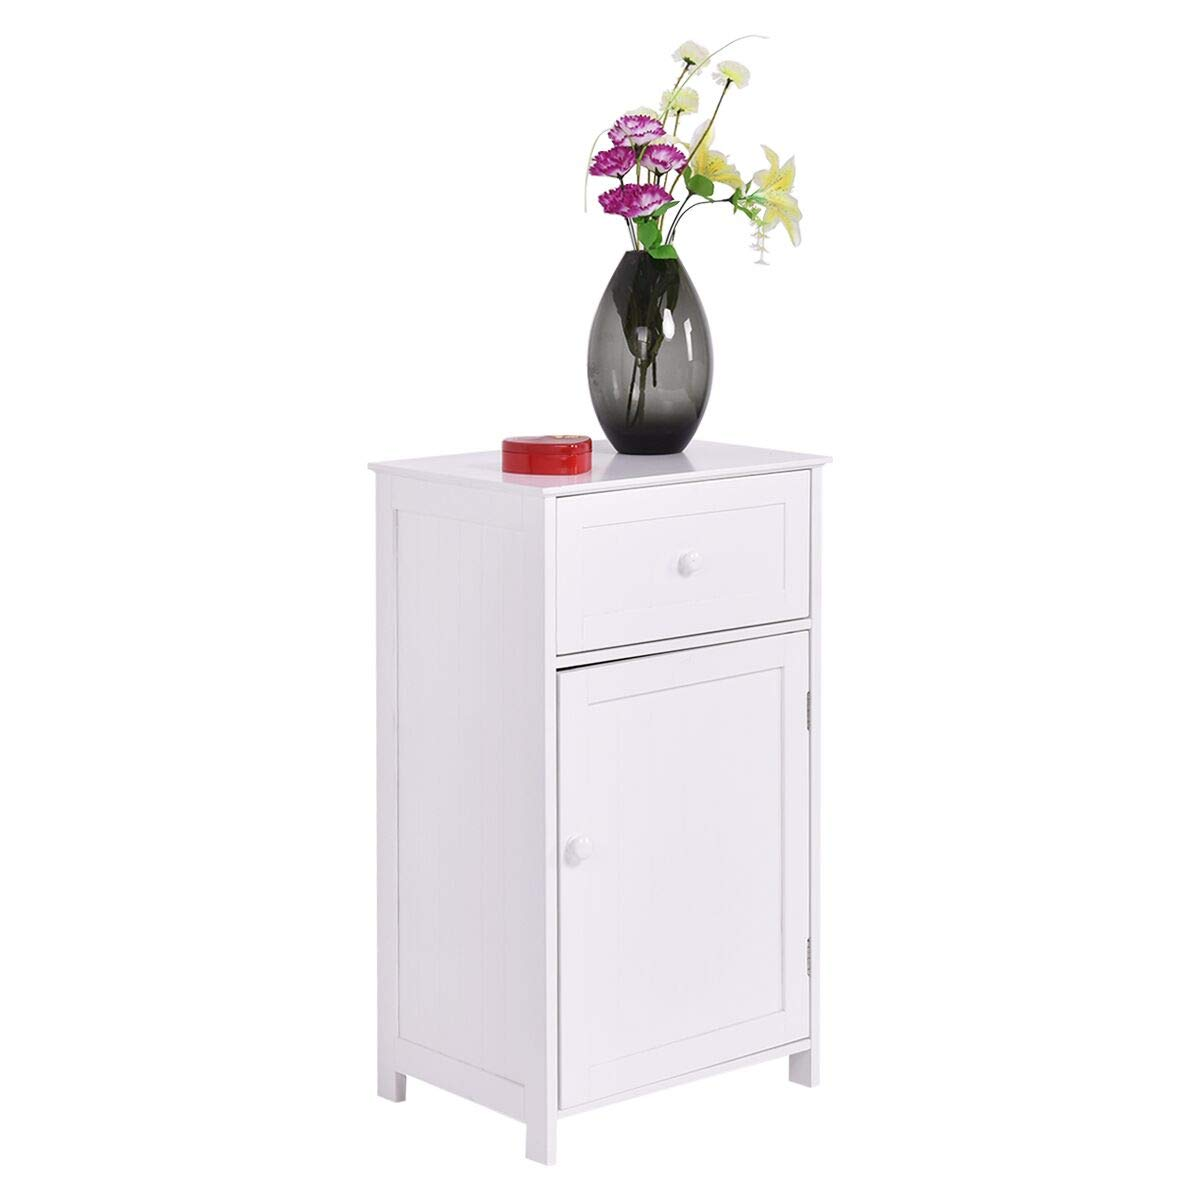 "Tangkula Bathroom Floor Storage Cabinet, Home Living Room Bedroom Sturdy Wooden Modern Side Cabinet Organizer, Storage Cabinet Furniture (30"" with Door & Drawer)"